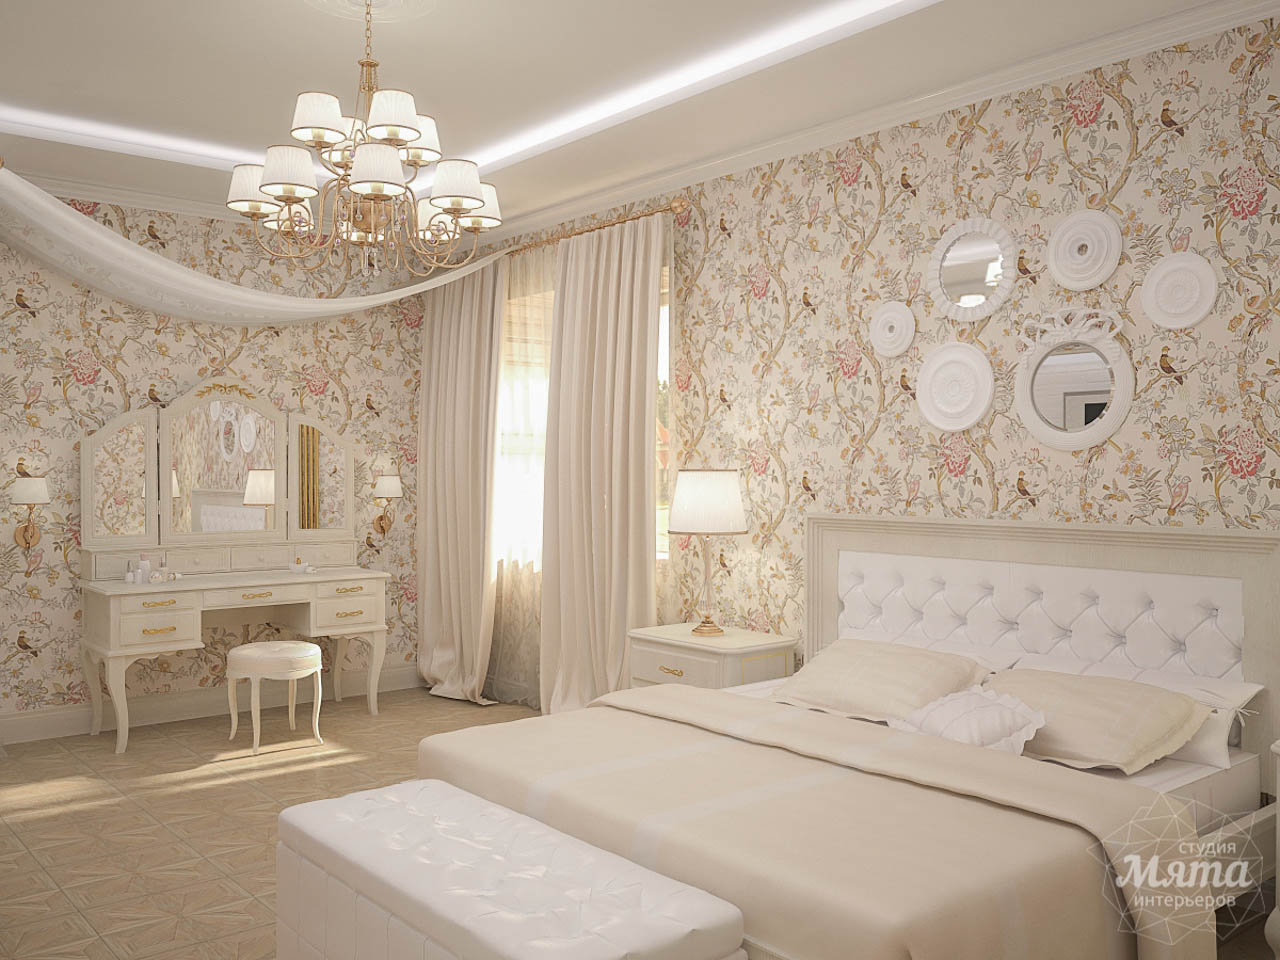 Дизайн интерьера коттеджа по ул. Ландышевая 23 img648867425